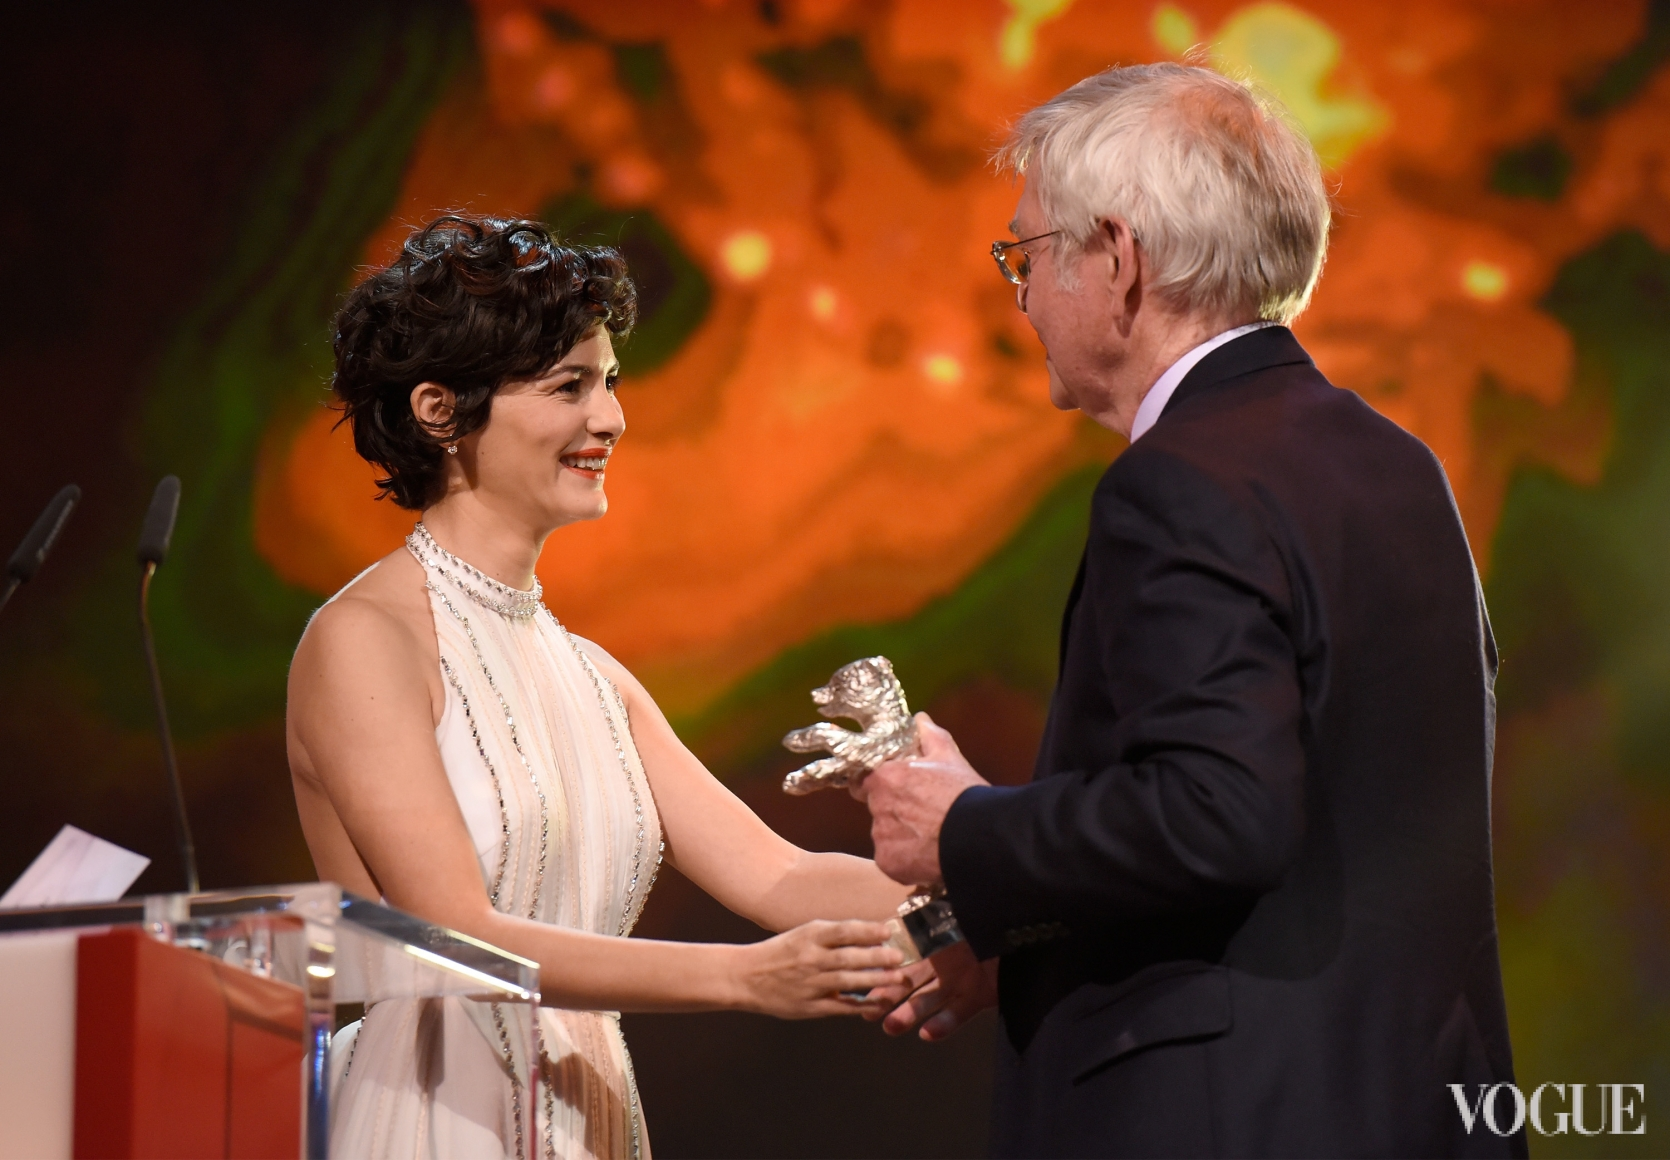 Одри Тоту награждает Тома Кортни